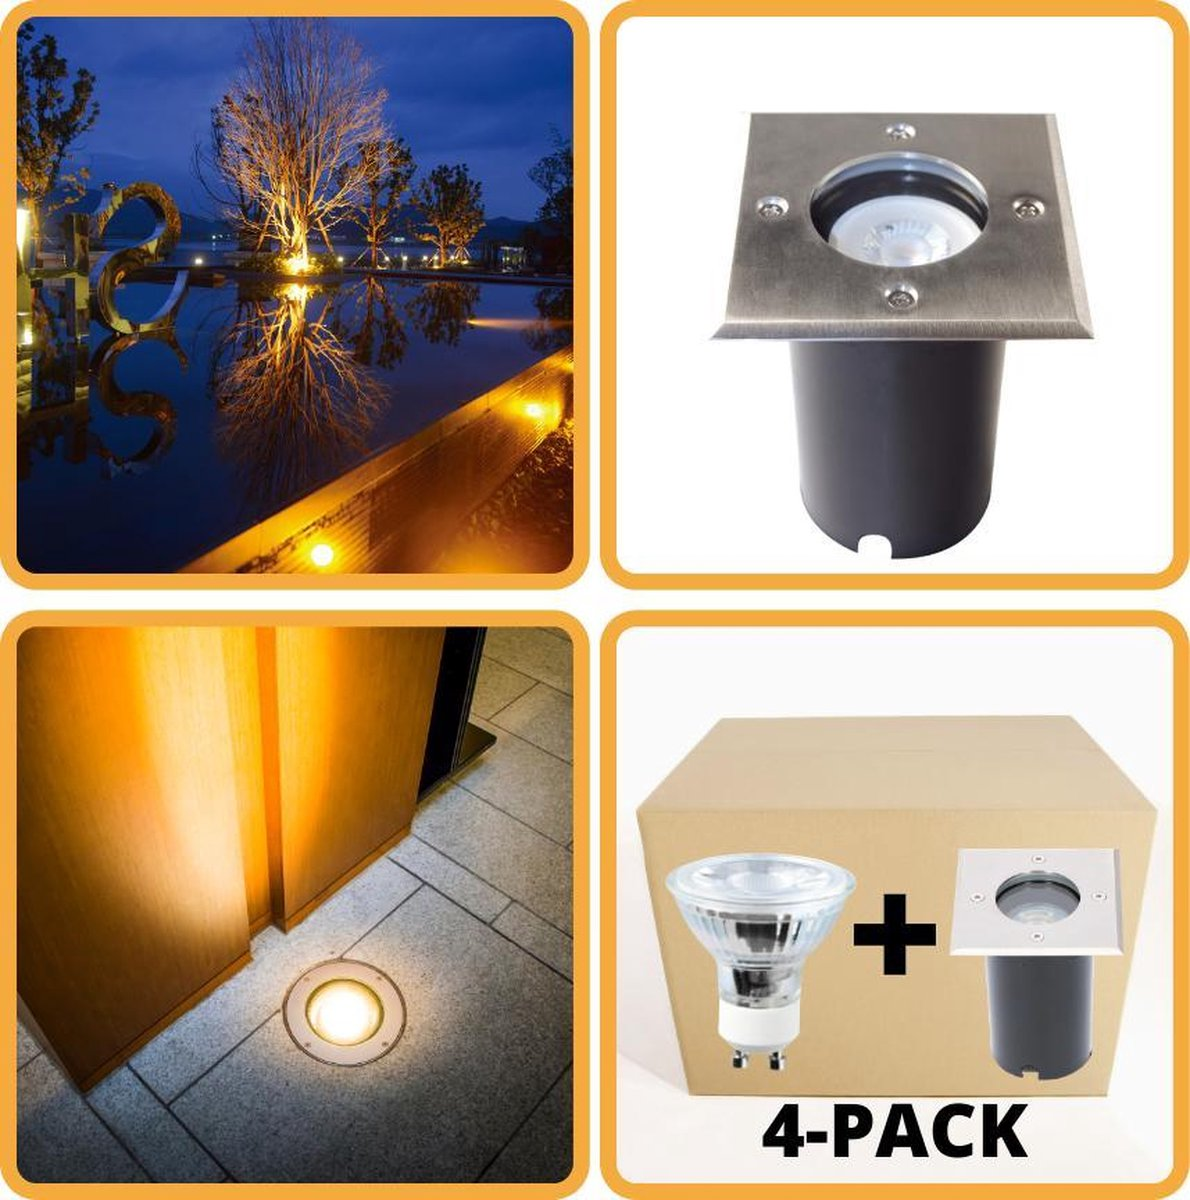 Proventa HeavyDuty LED Grondspots IP67 - Vierkant - 4 x inbouw tuinspots buiten - warm wit